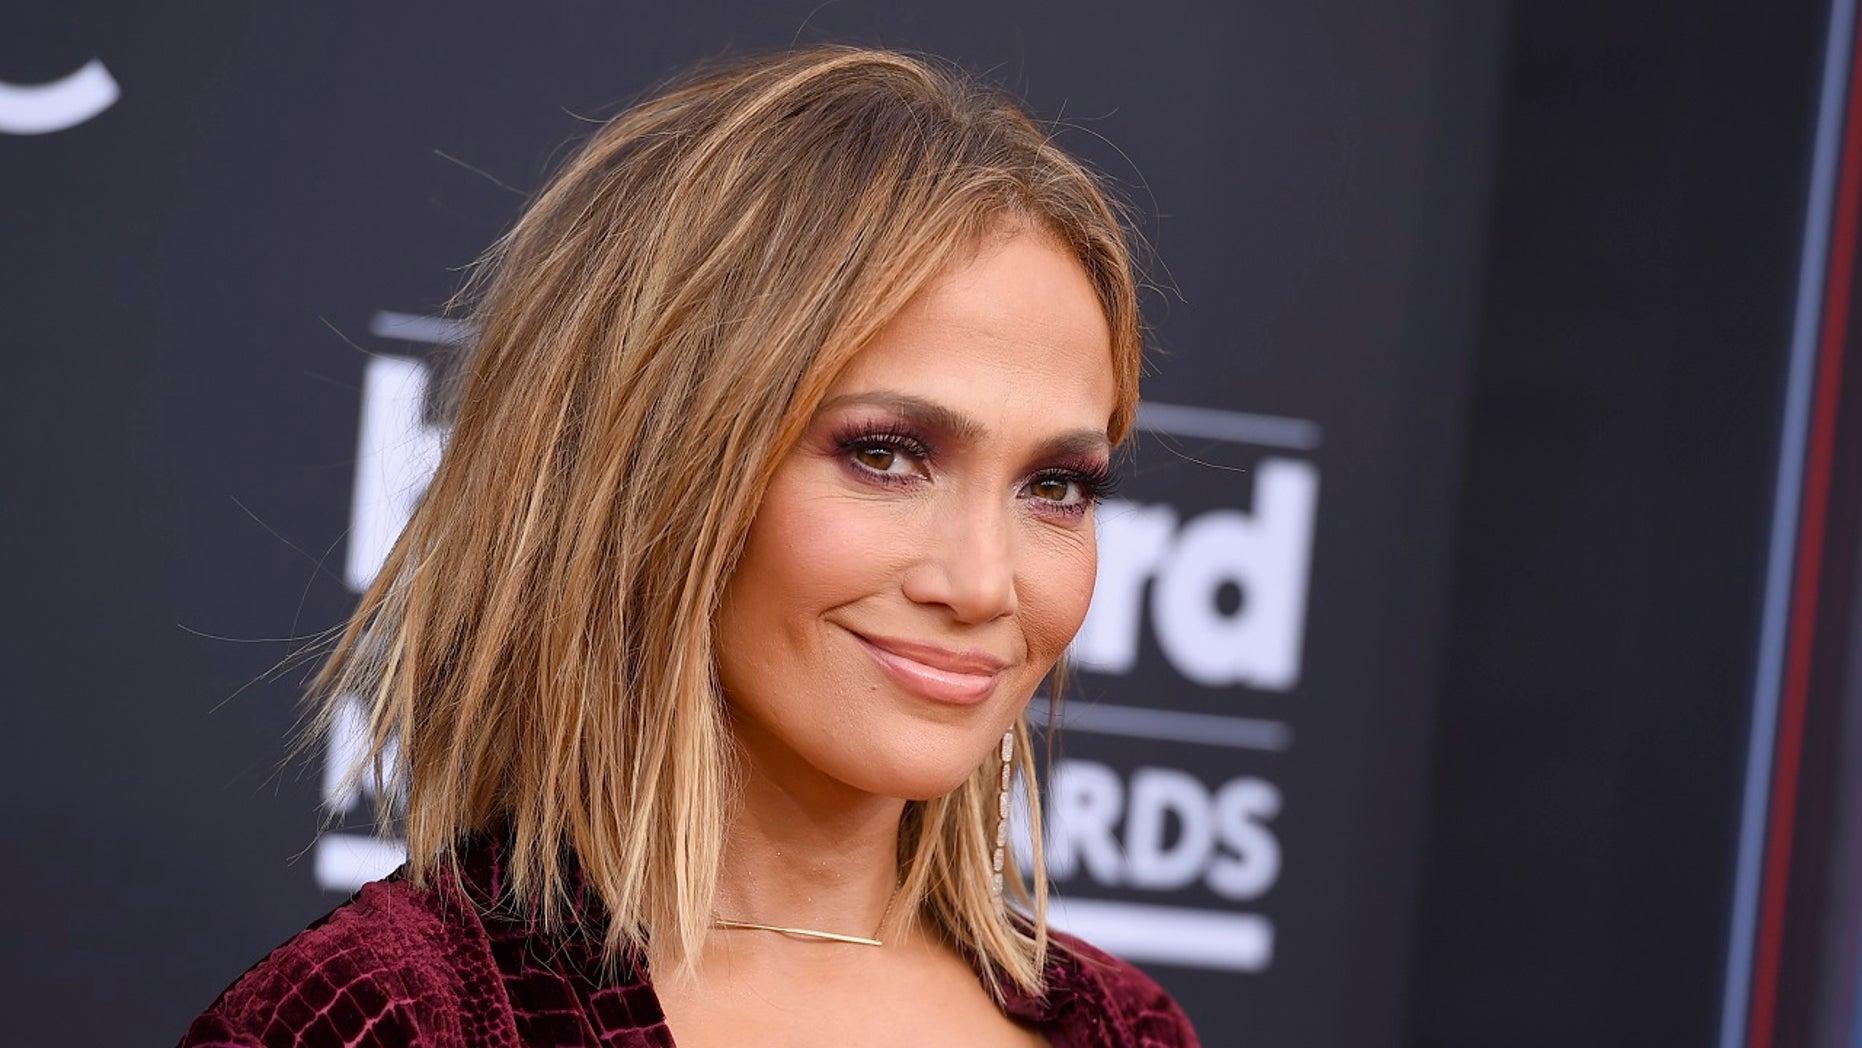 Jennifer Lopez jlo) Instagram photos and